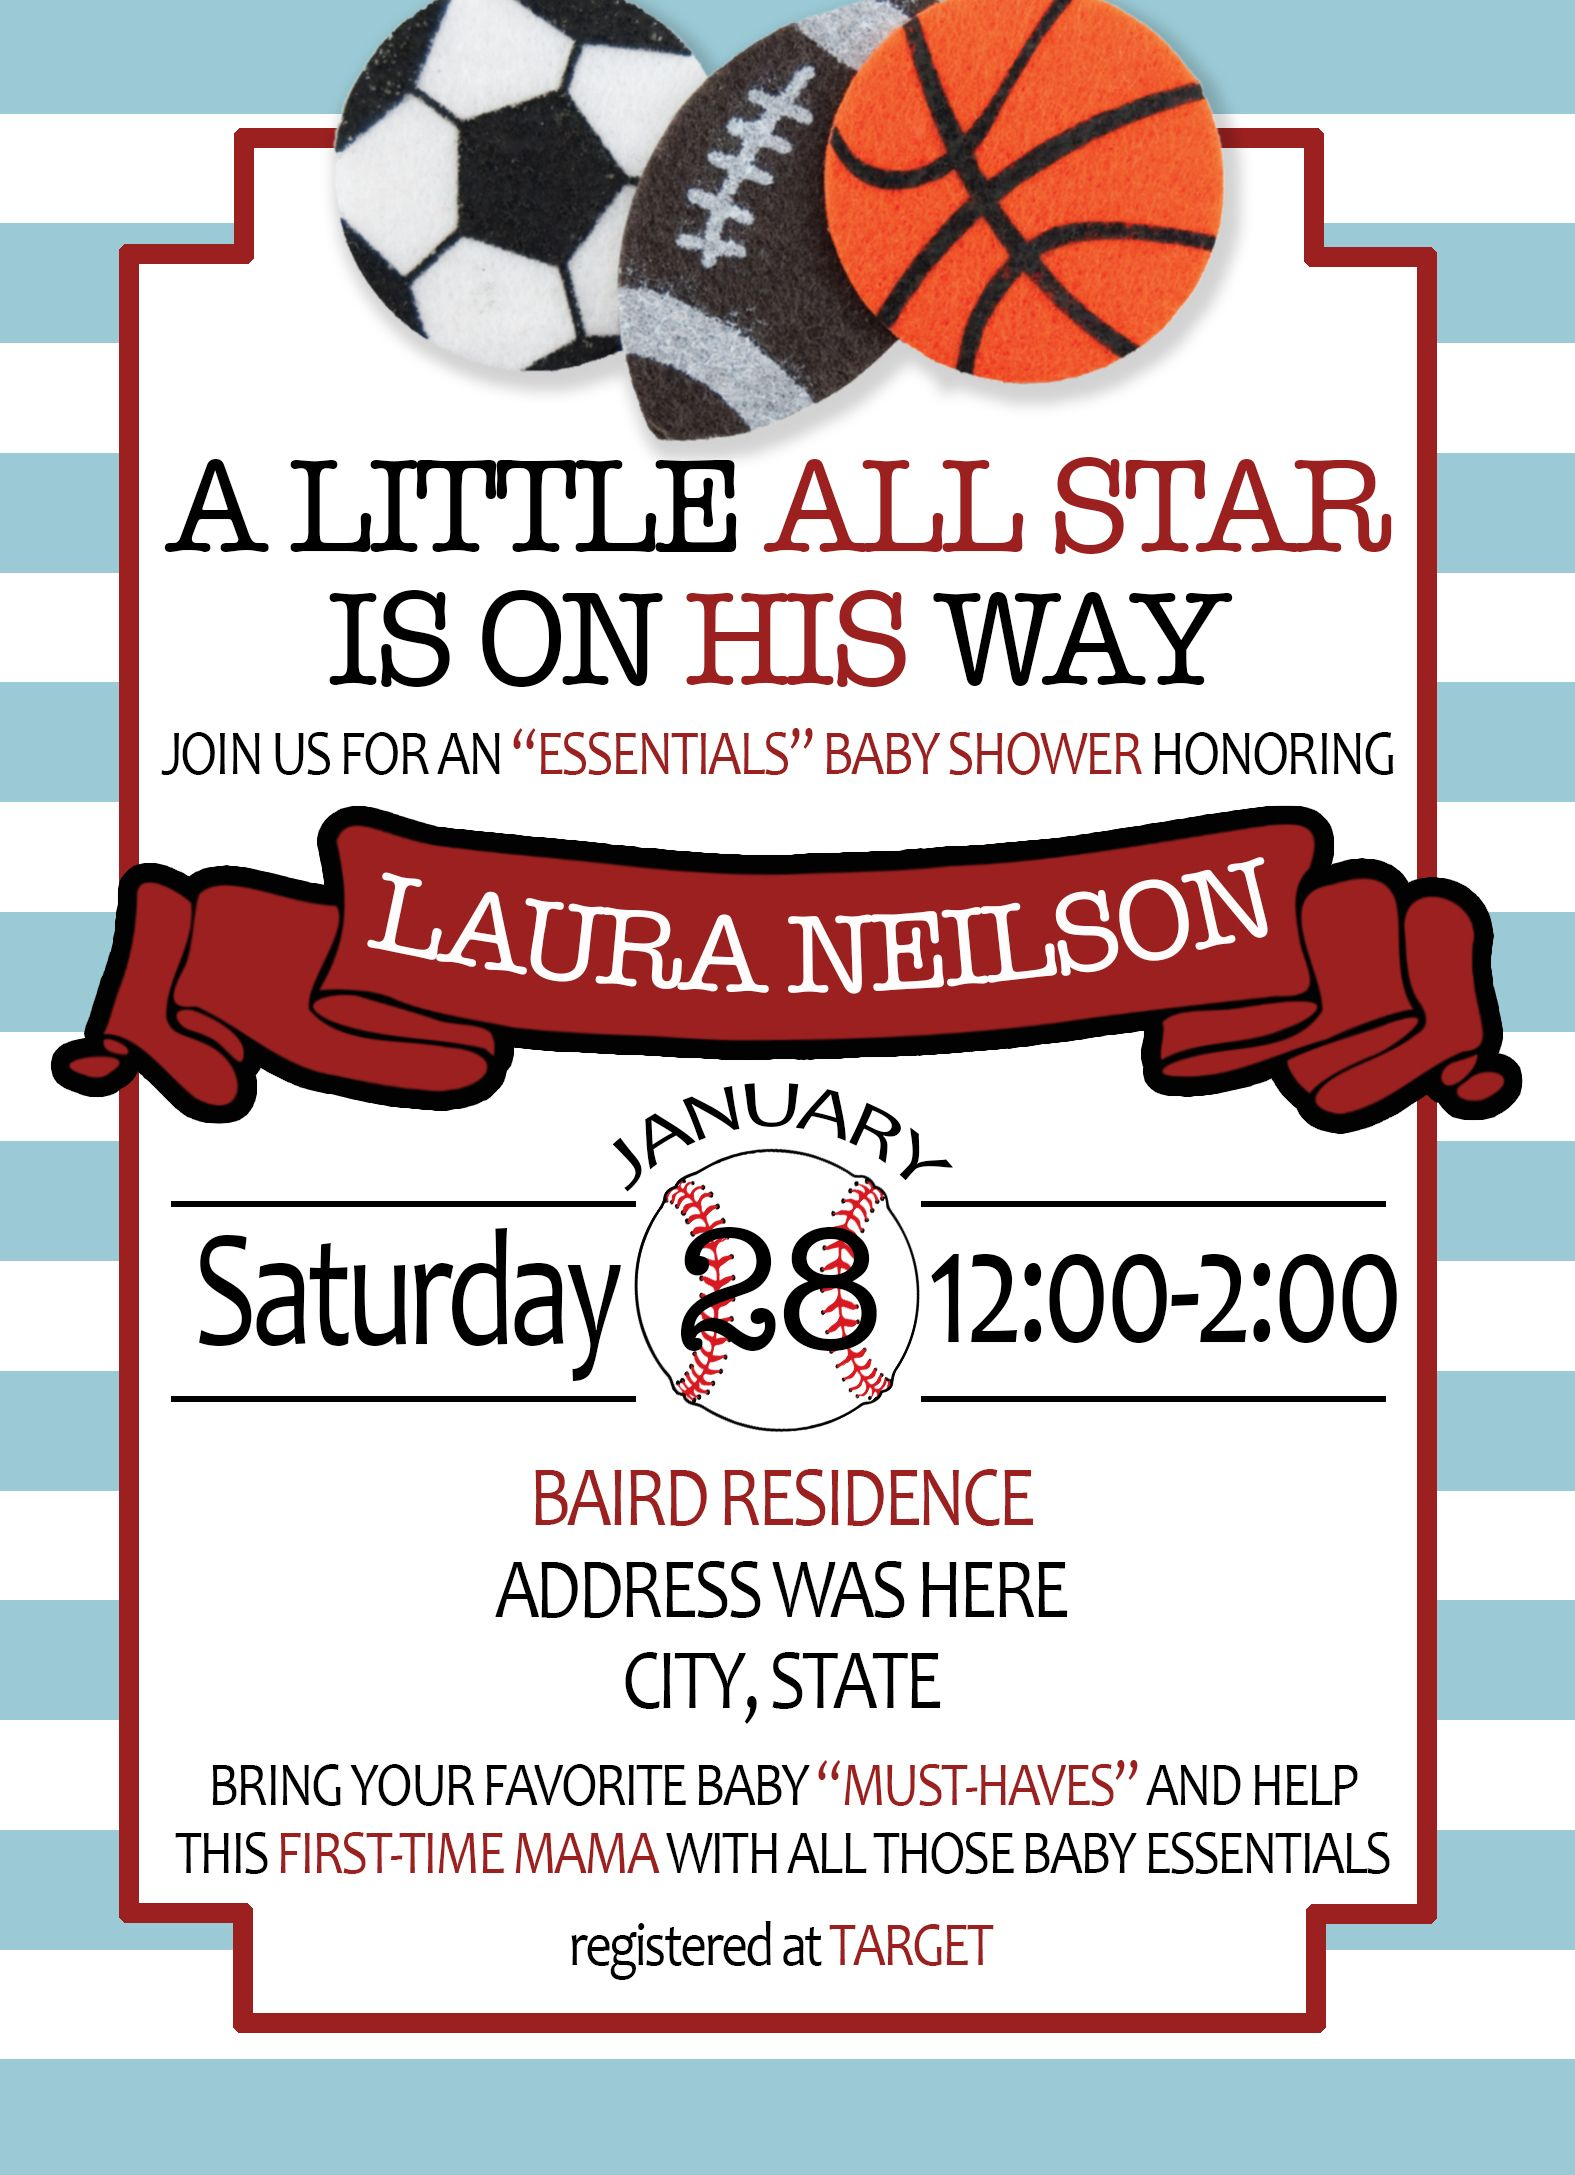 All Star Baby Shower Invitation | Camille Creates | Pinterest | Star ...